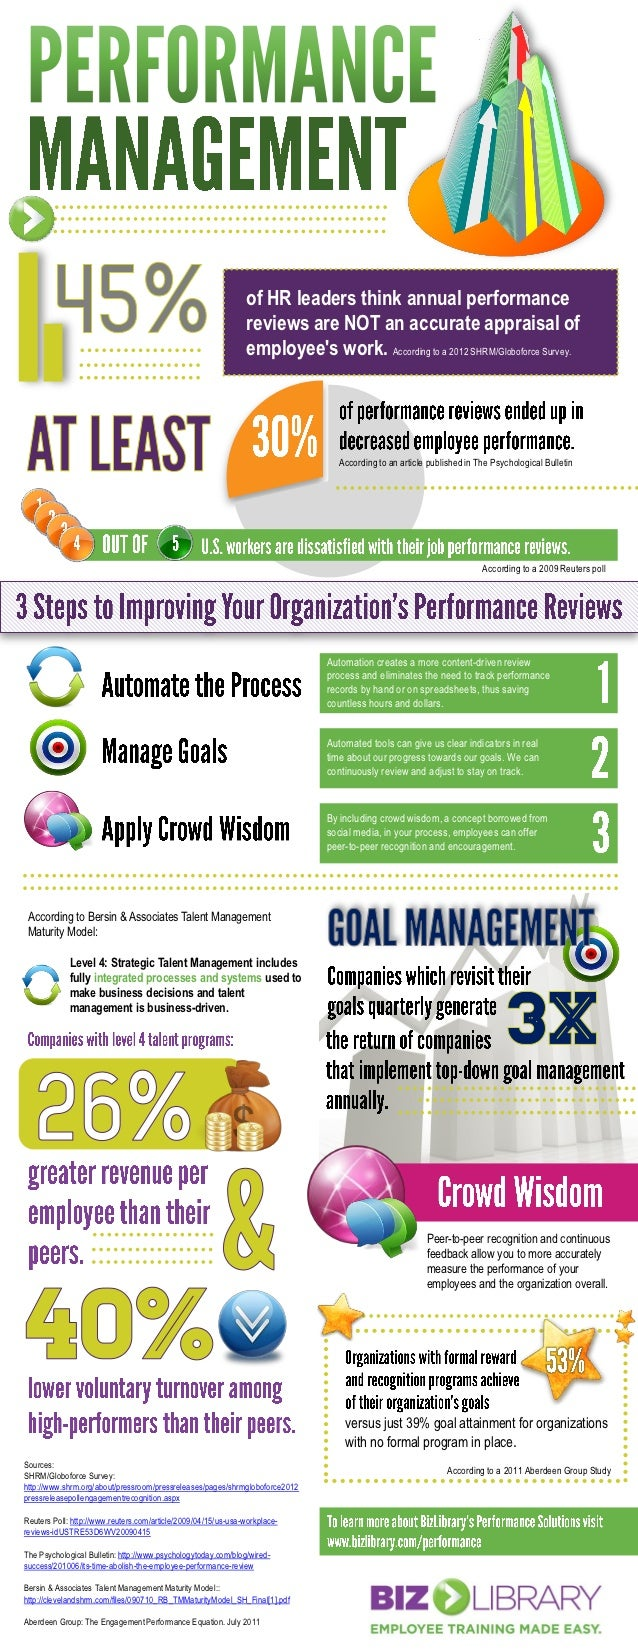 3 stepstoimproveperformancemgmt infographic